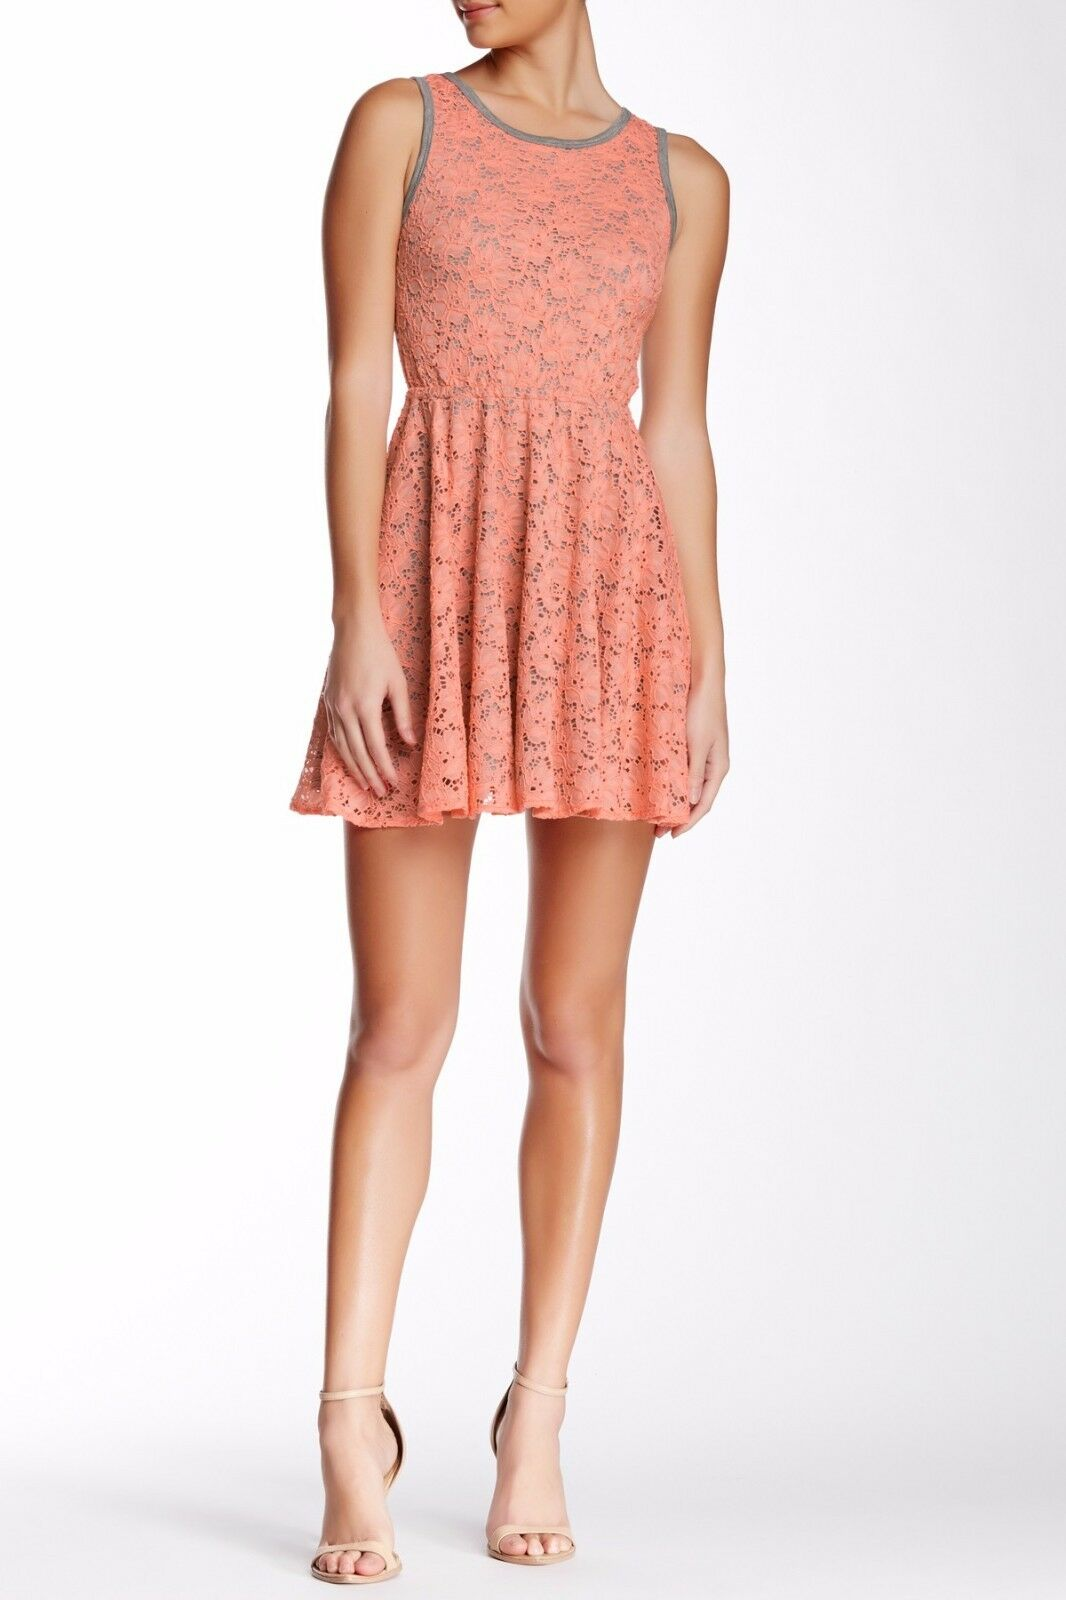 NWT Trina Turk Crestline Sleeveless Lace Dress  – L